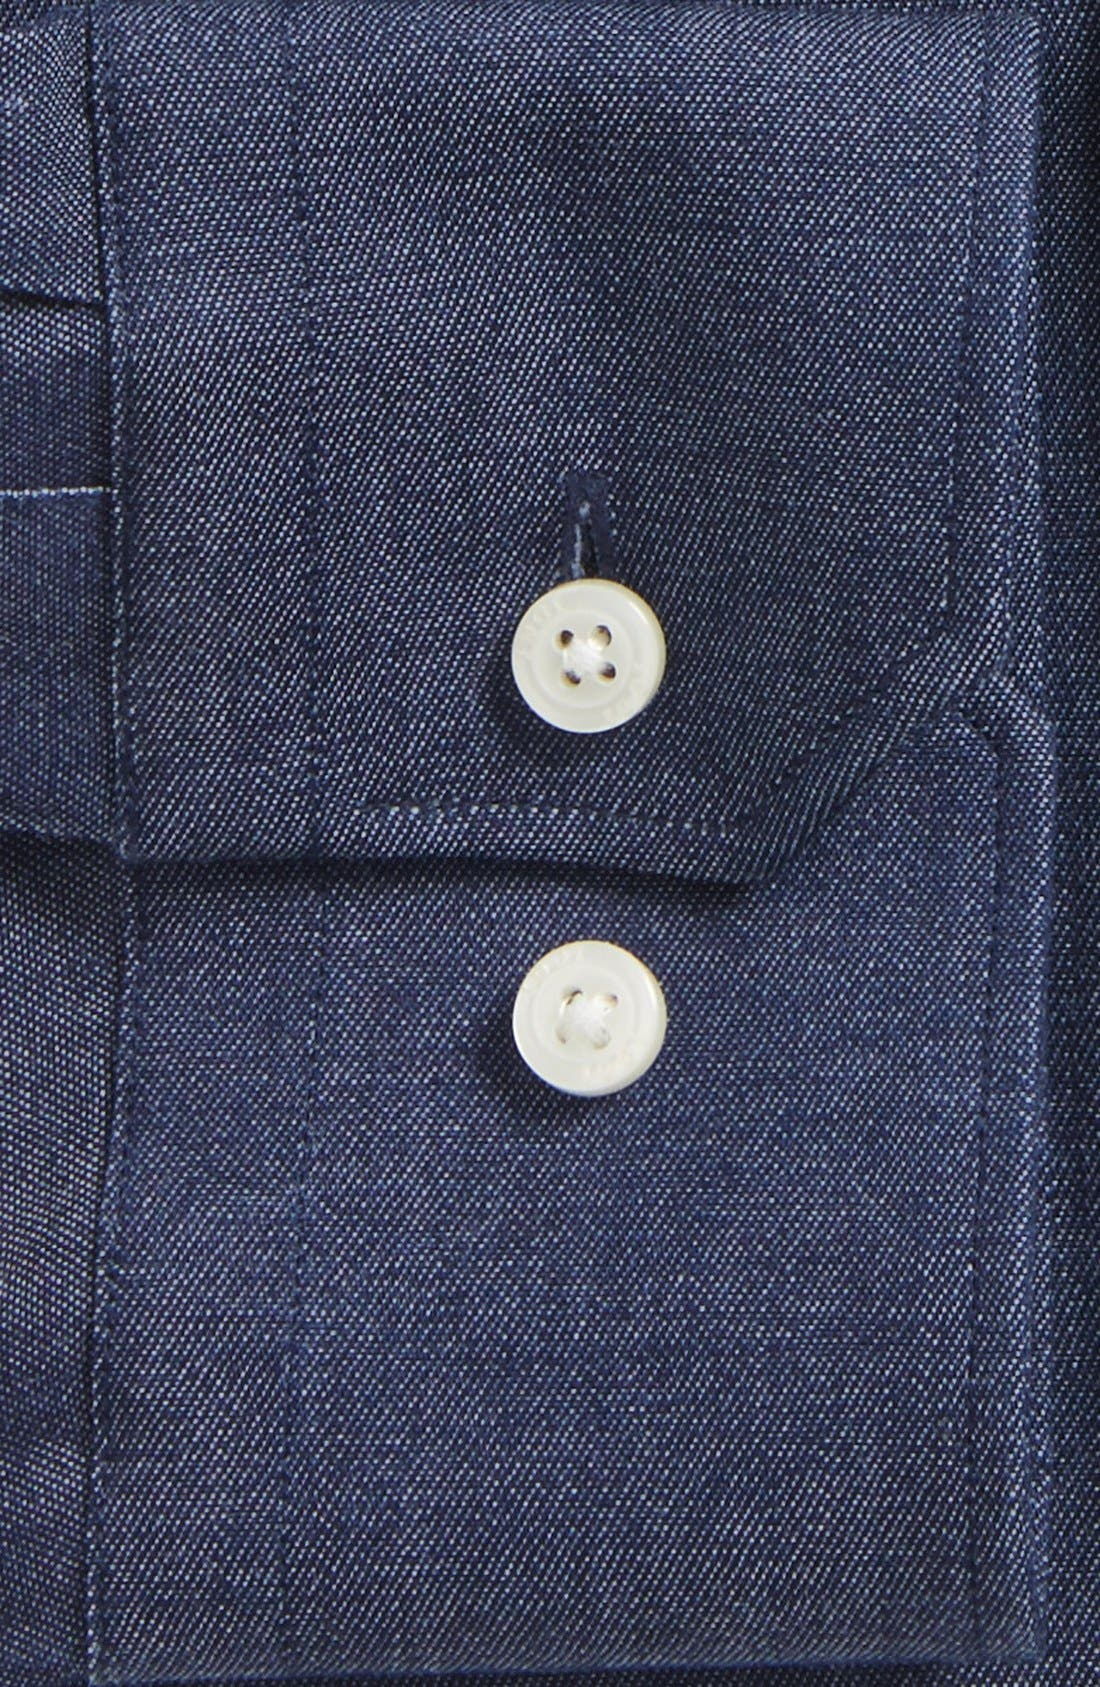 Alternate Image 2  - 1901 Extra Trim Fit Dress Shirt